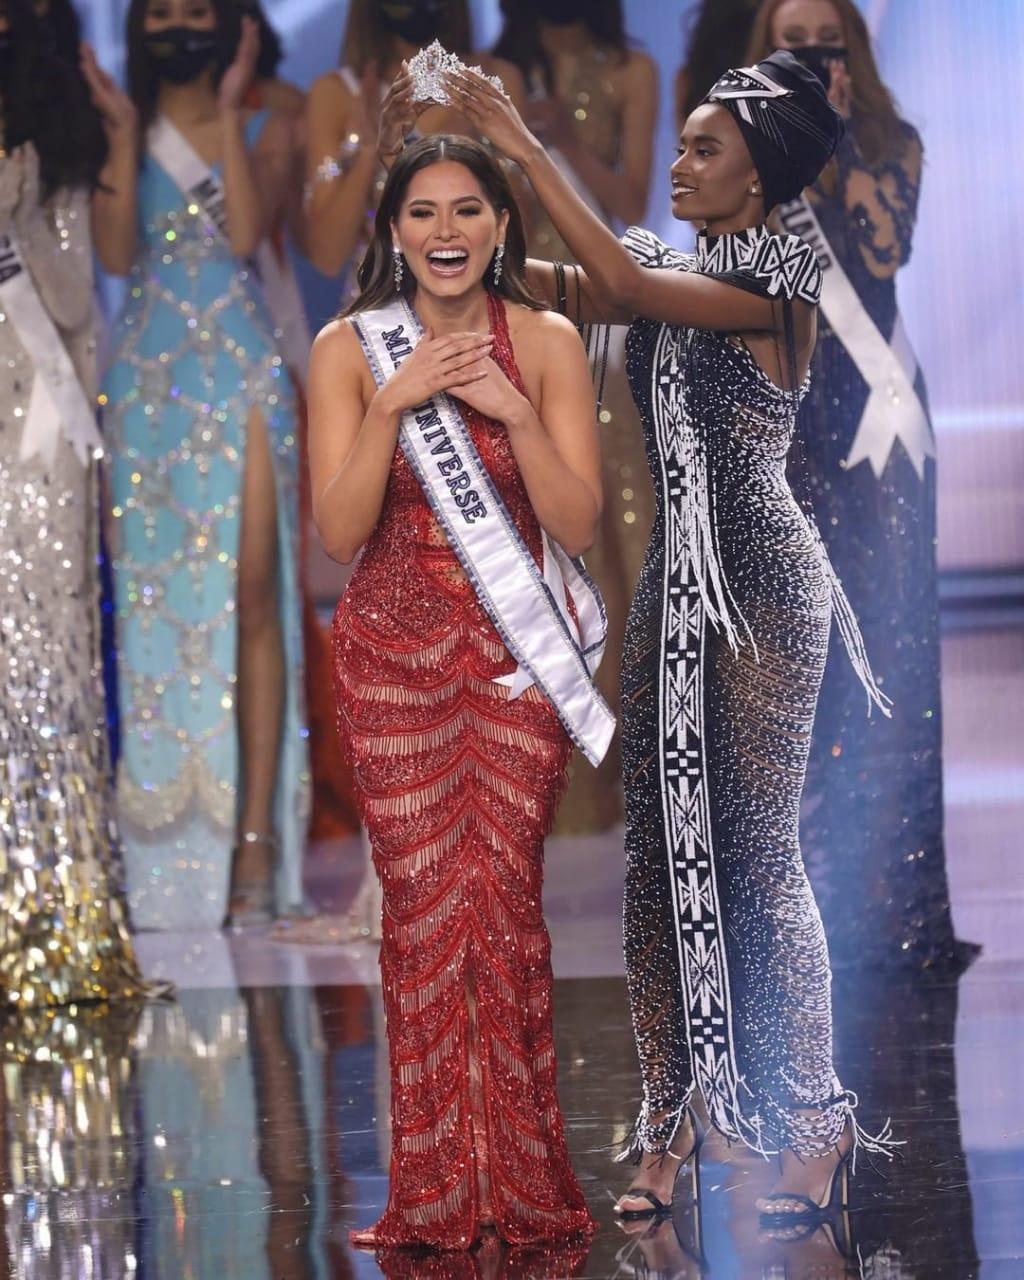 Veteran-Pageants-Andrea-Meza-Dari-Mexico-Winner-Miss-Universe-2020